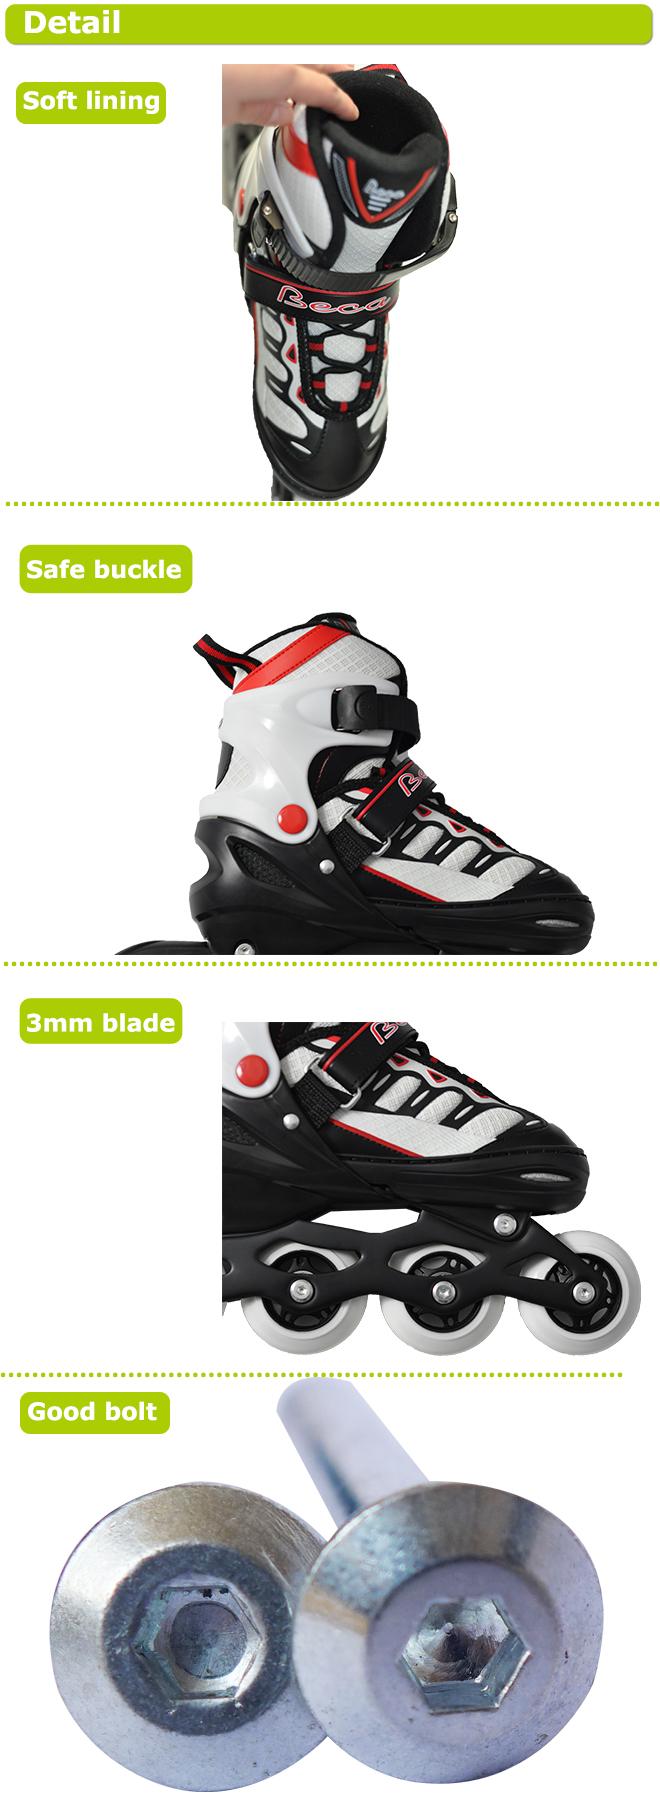 Skate shoes price - China Roller Skates That Attach To Shoes Roller Skate Shoes Price Roller Skate